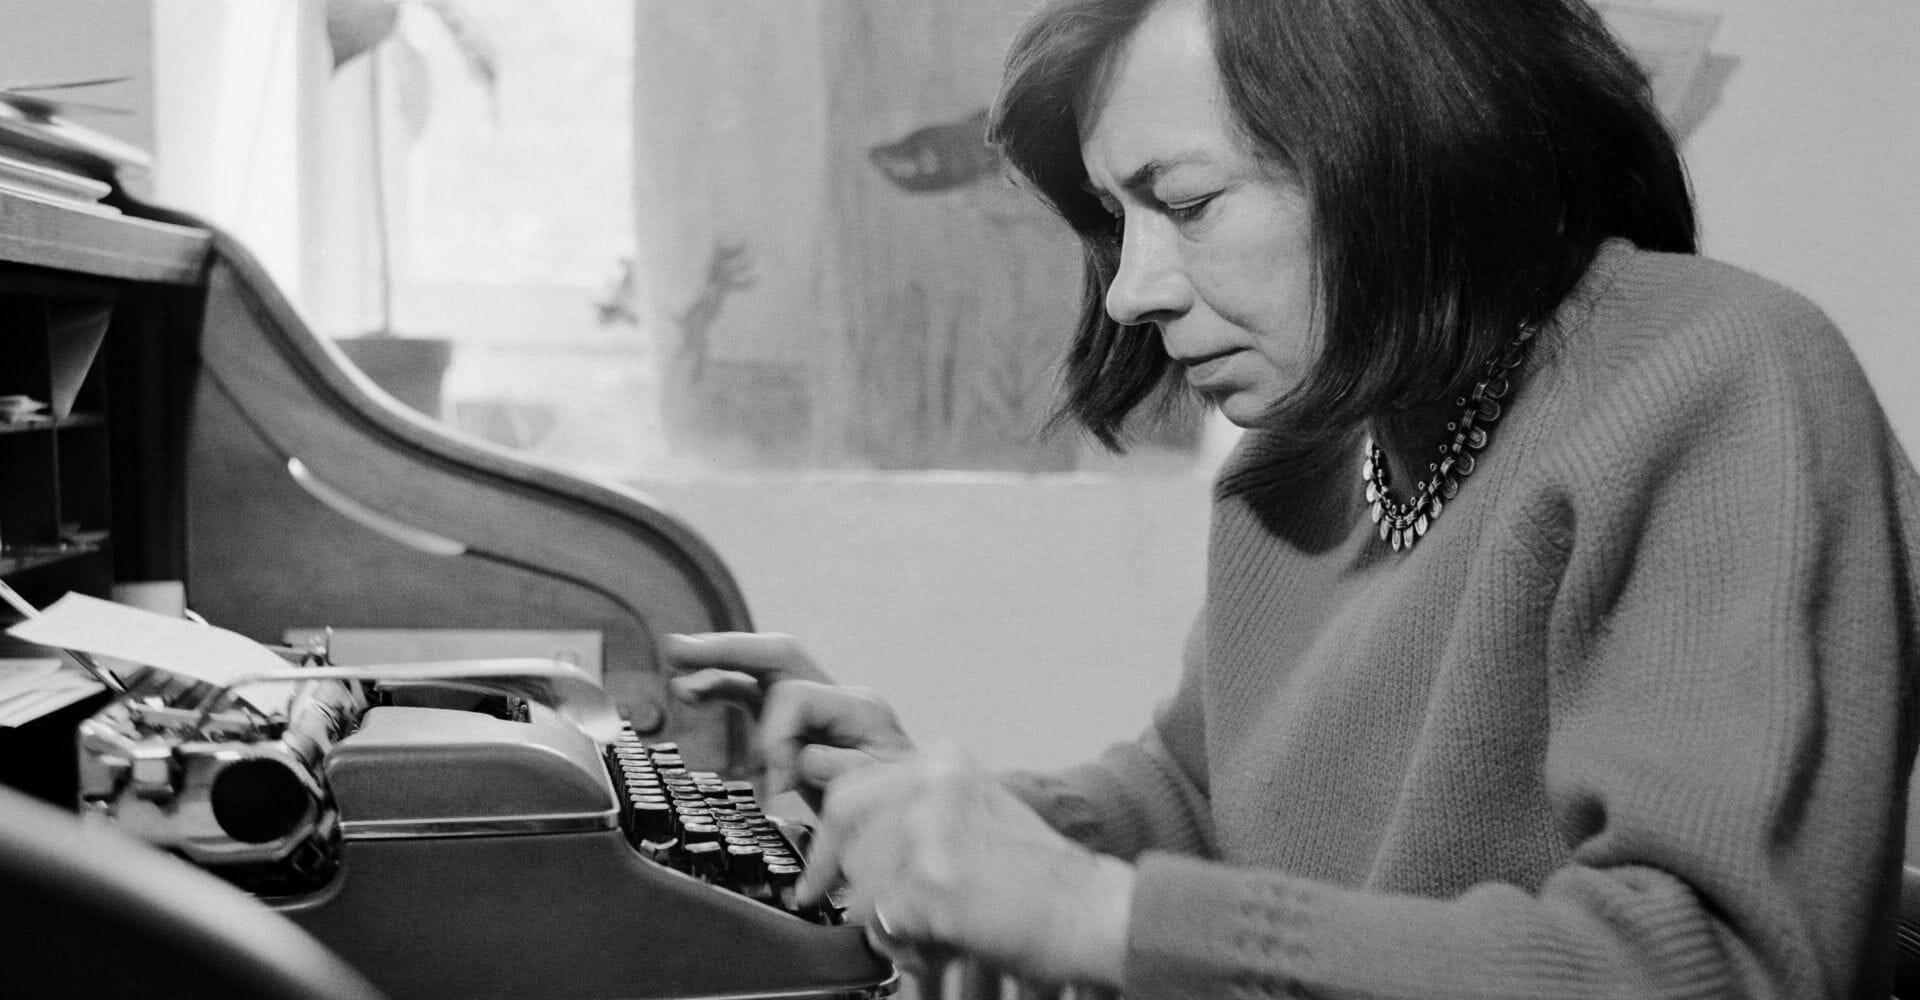 Patricia Highsmith, scrittrice ipnotista, in fuga con una valigia di fantasmi